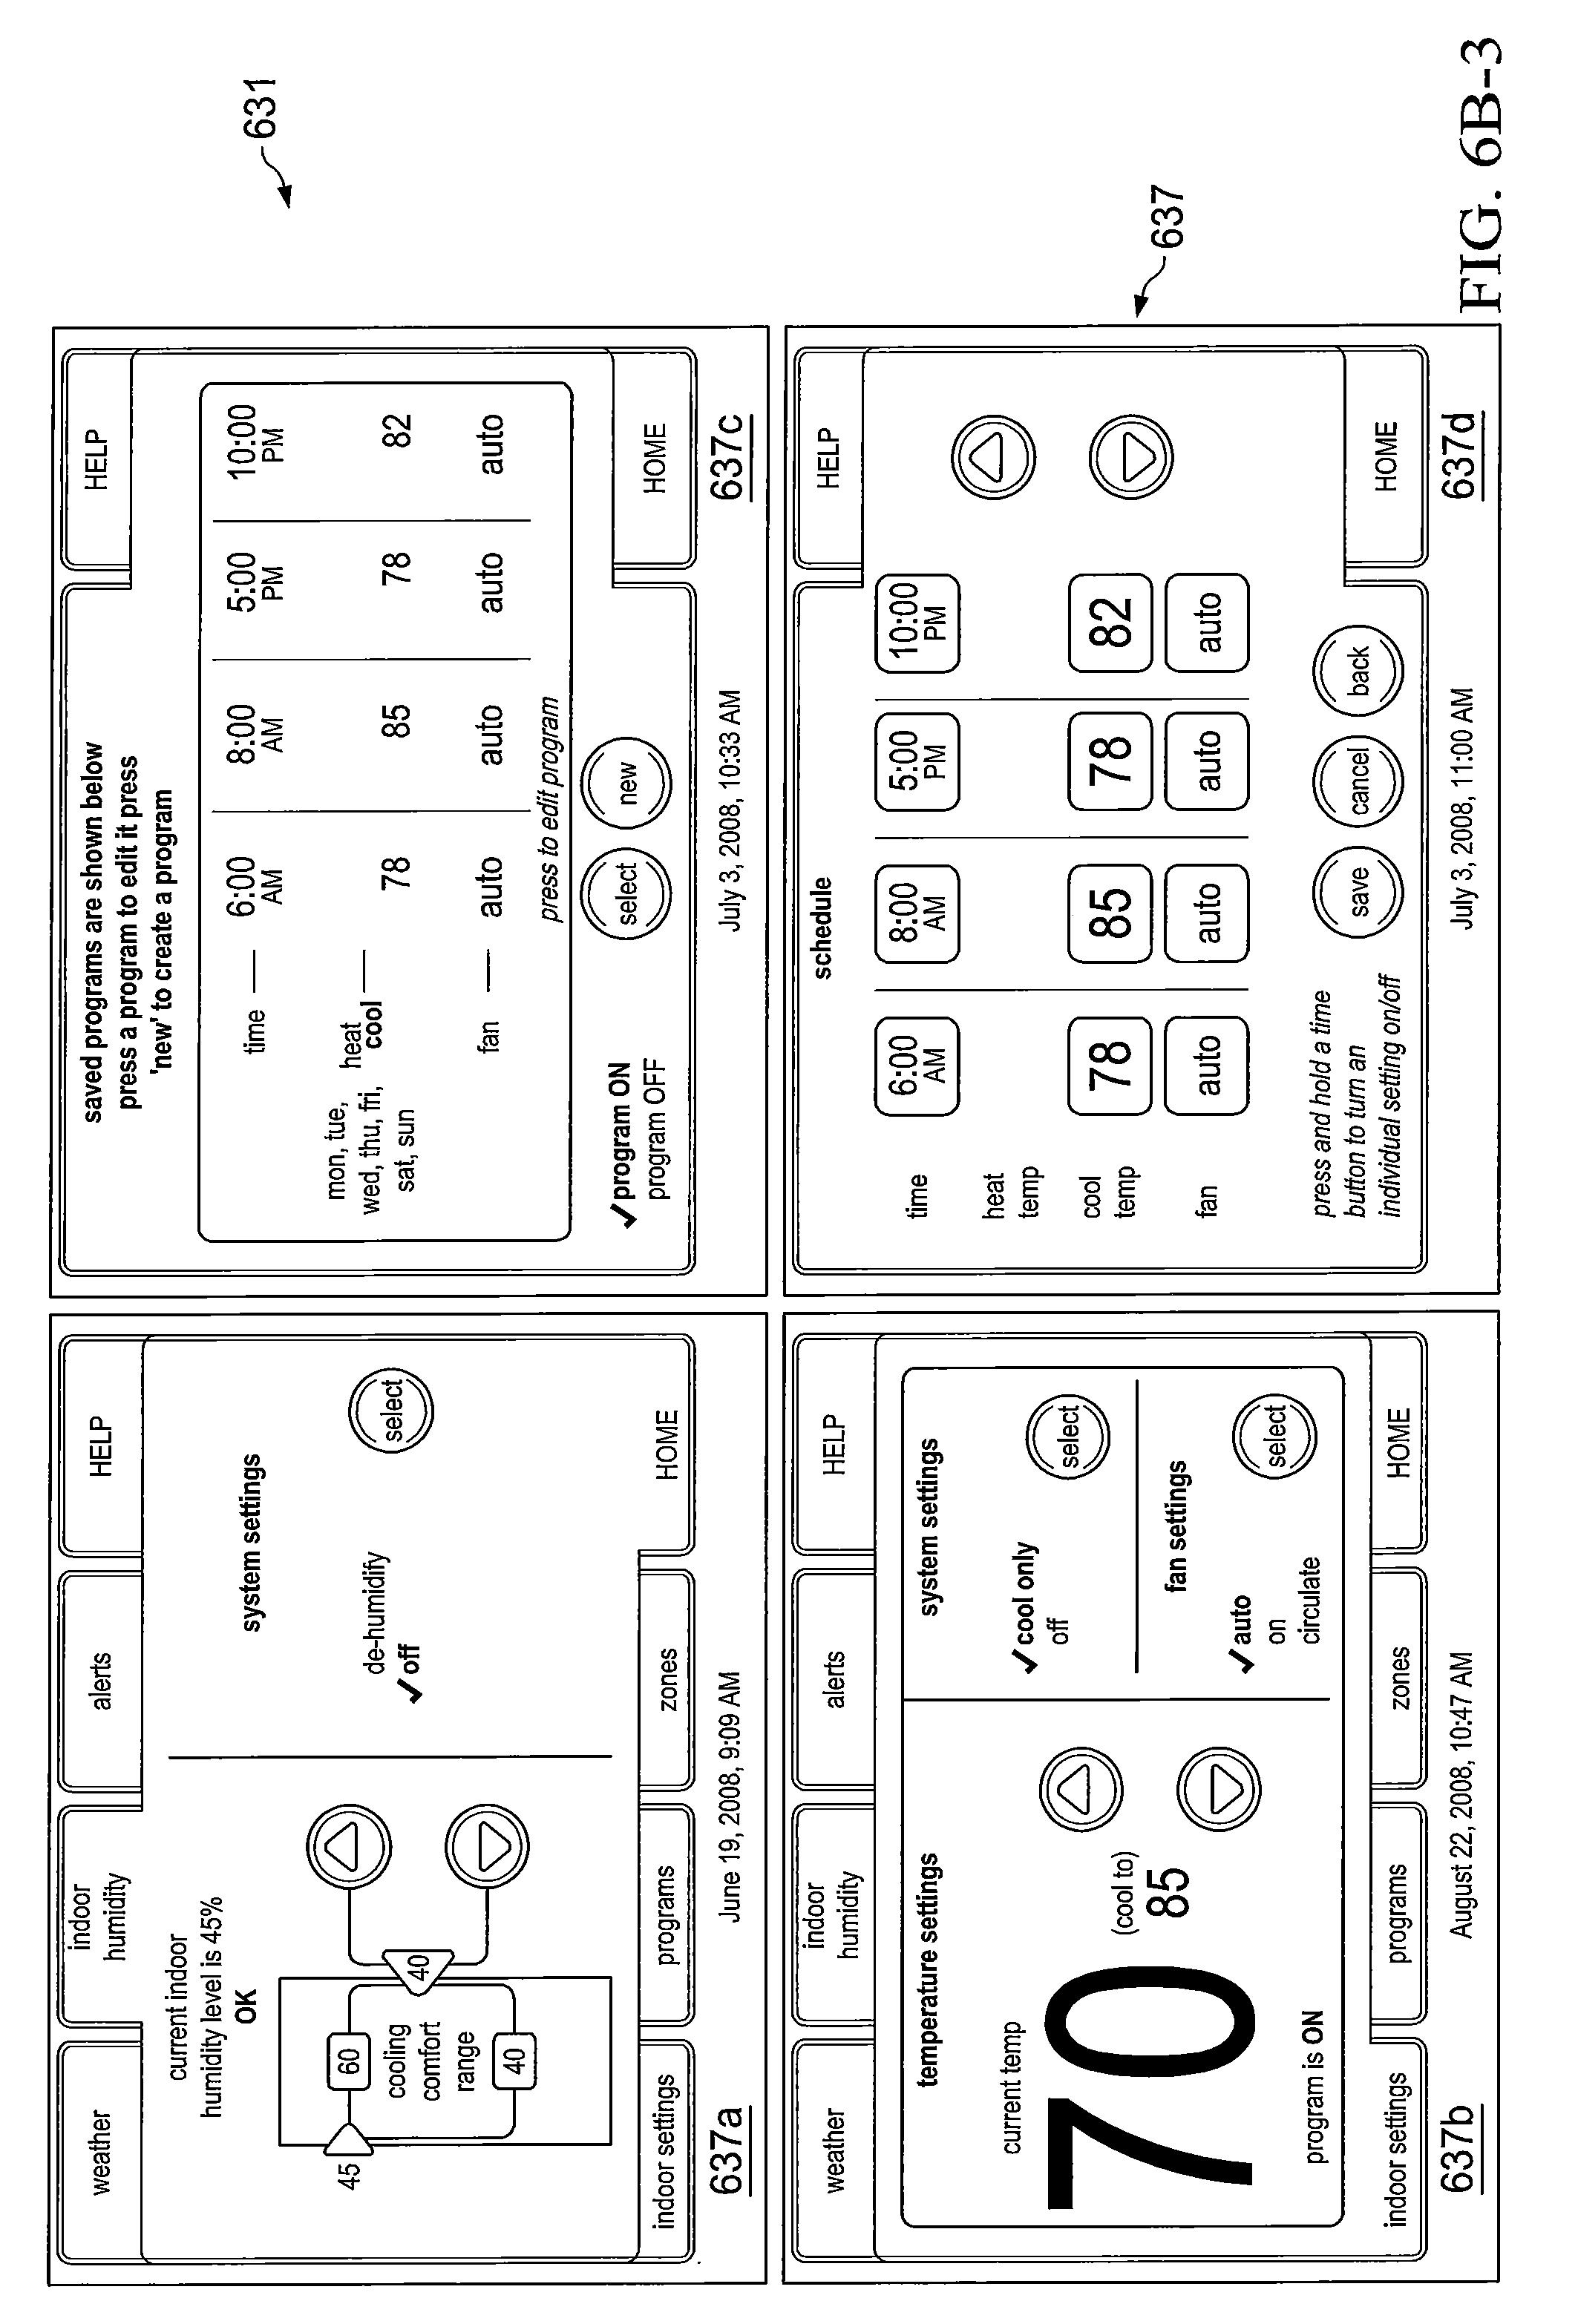 Patent us 8,452,456 b2.